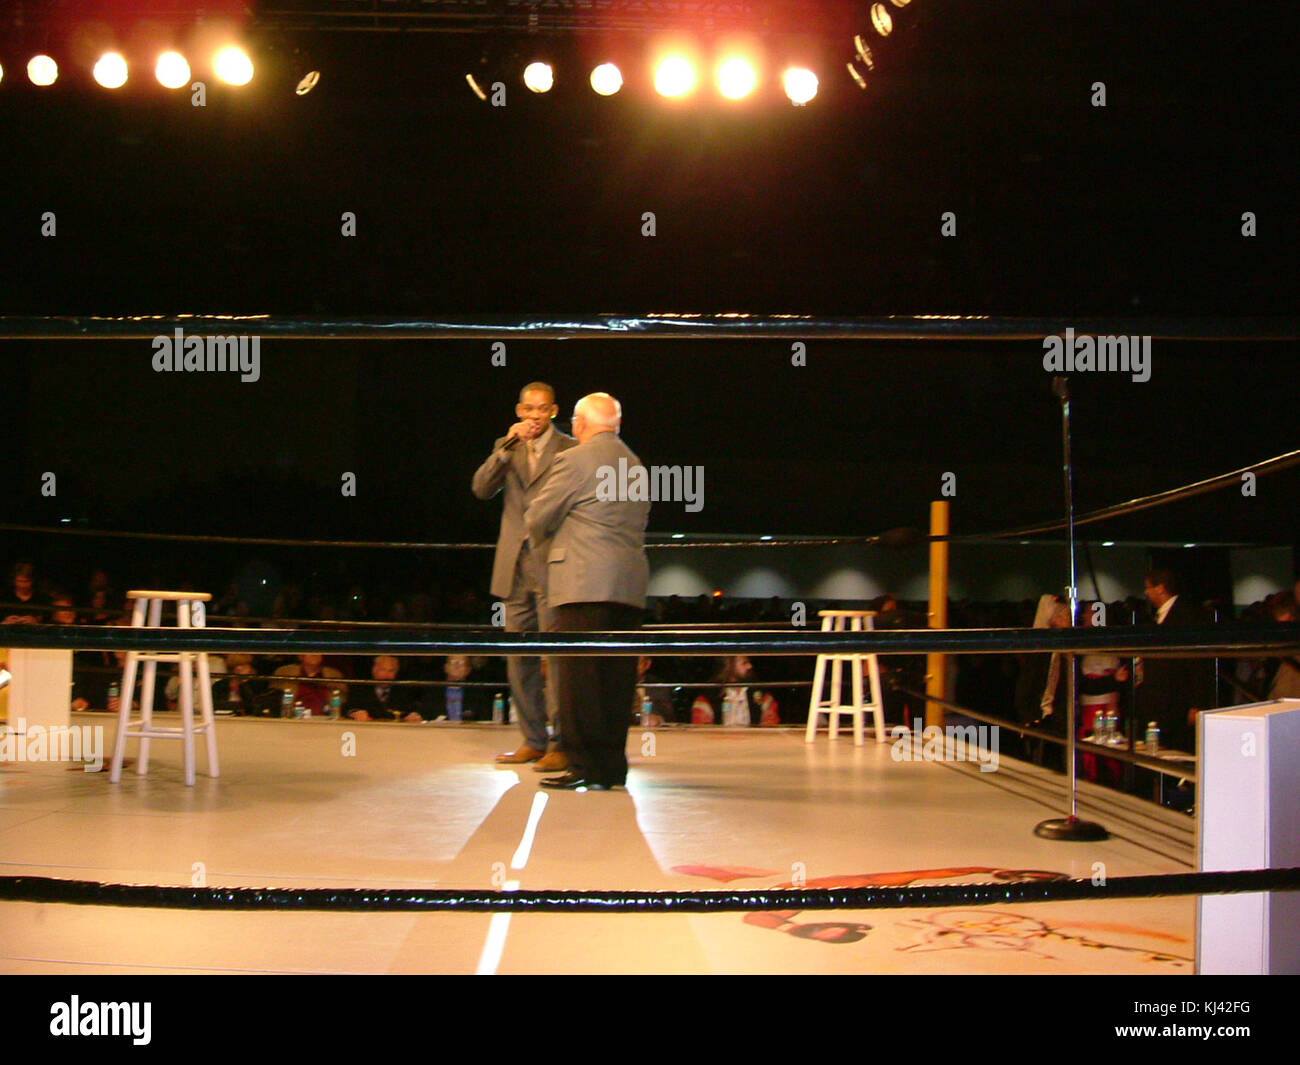 miami december 06 boxer muhammad ali photographed during art